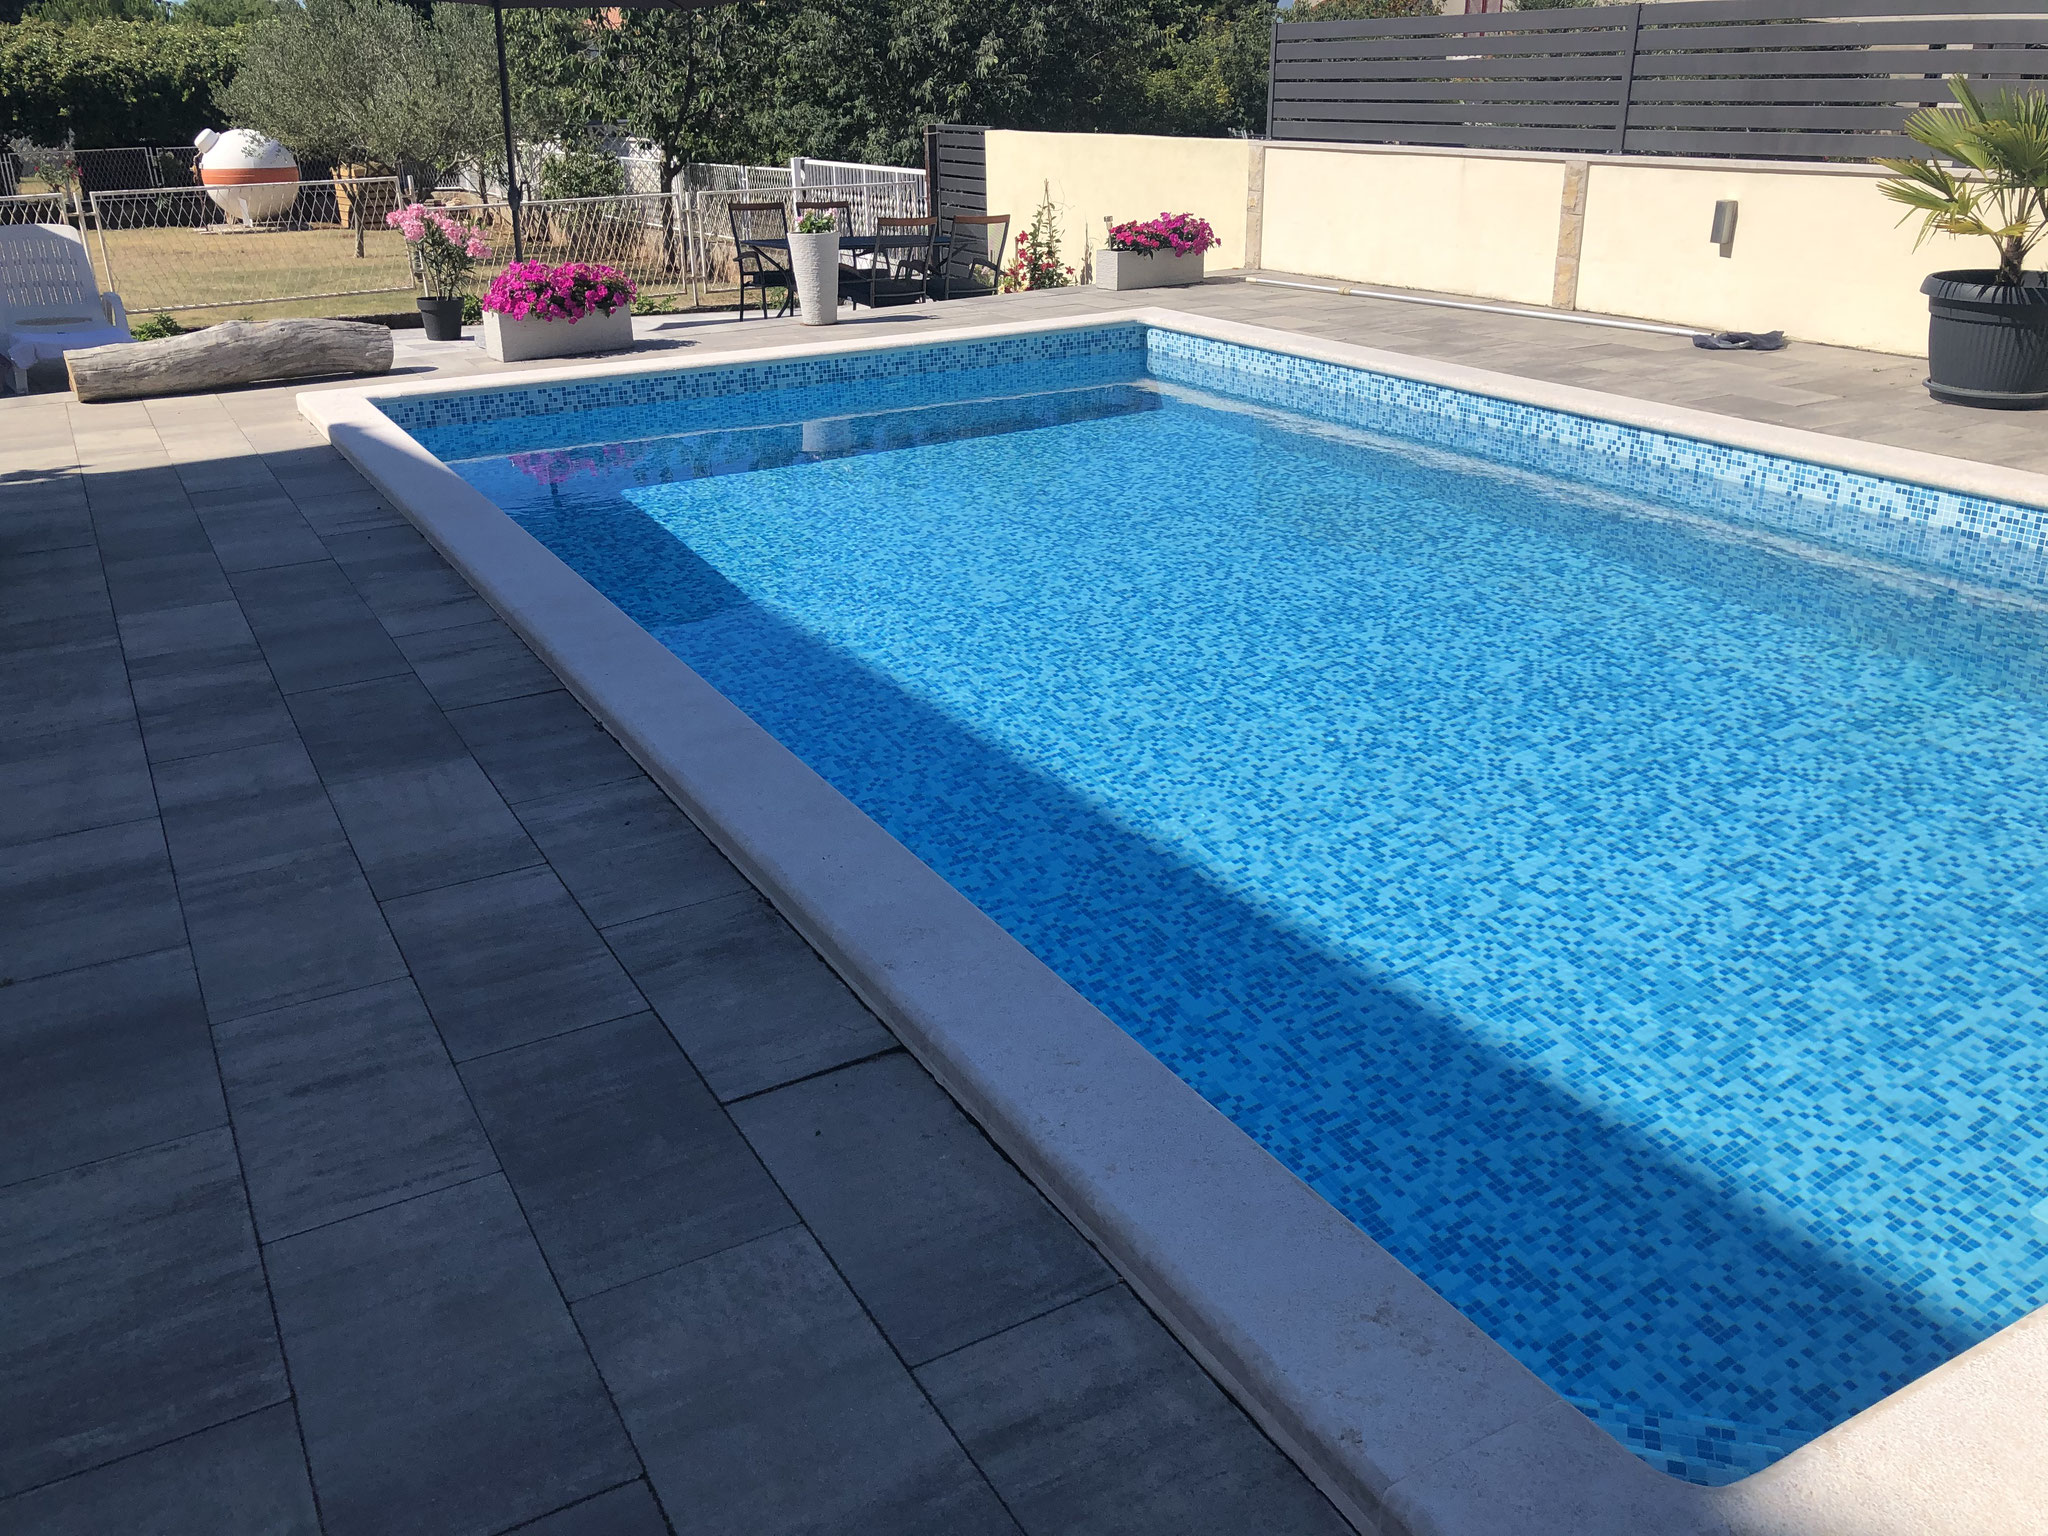 Villa Colonia Pool 2020